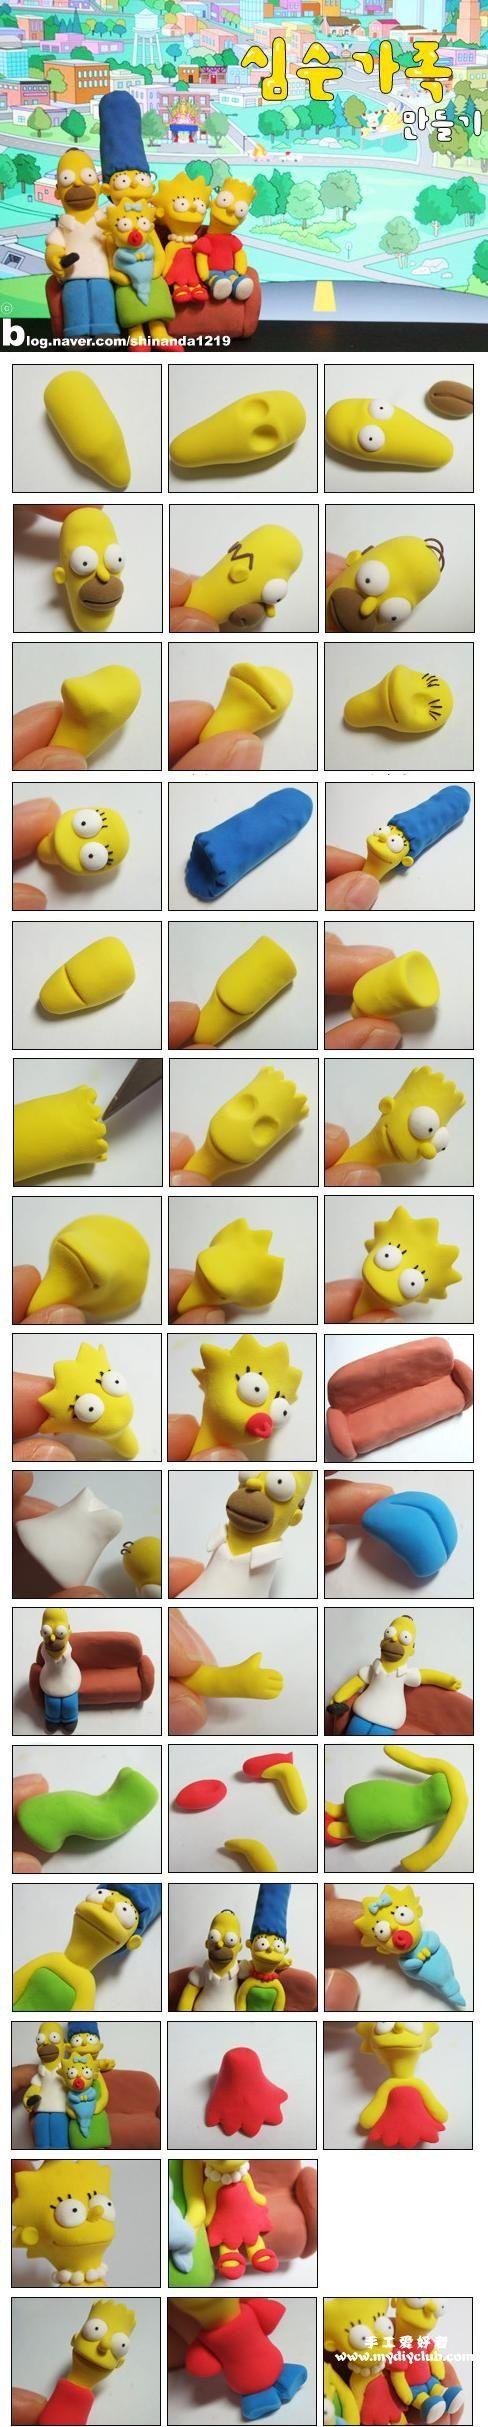 La famille Simpson en p芒te fimo